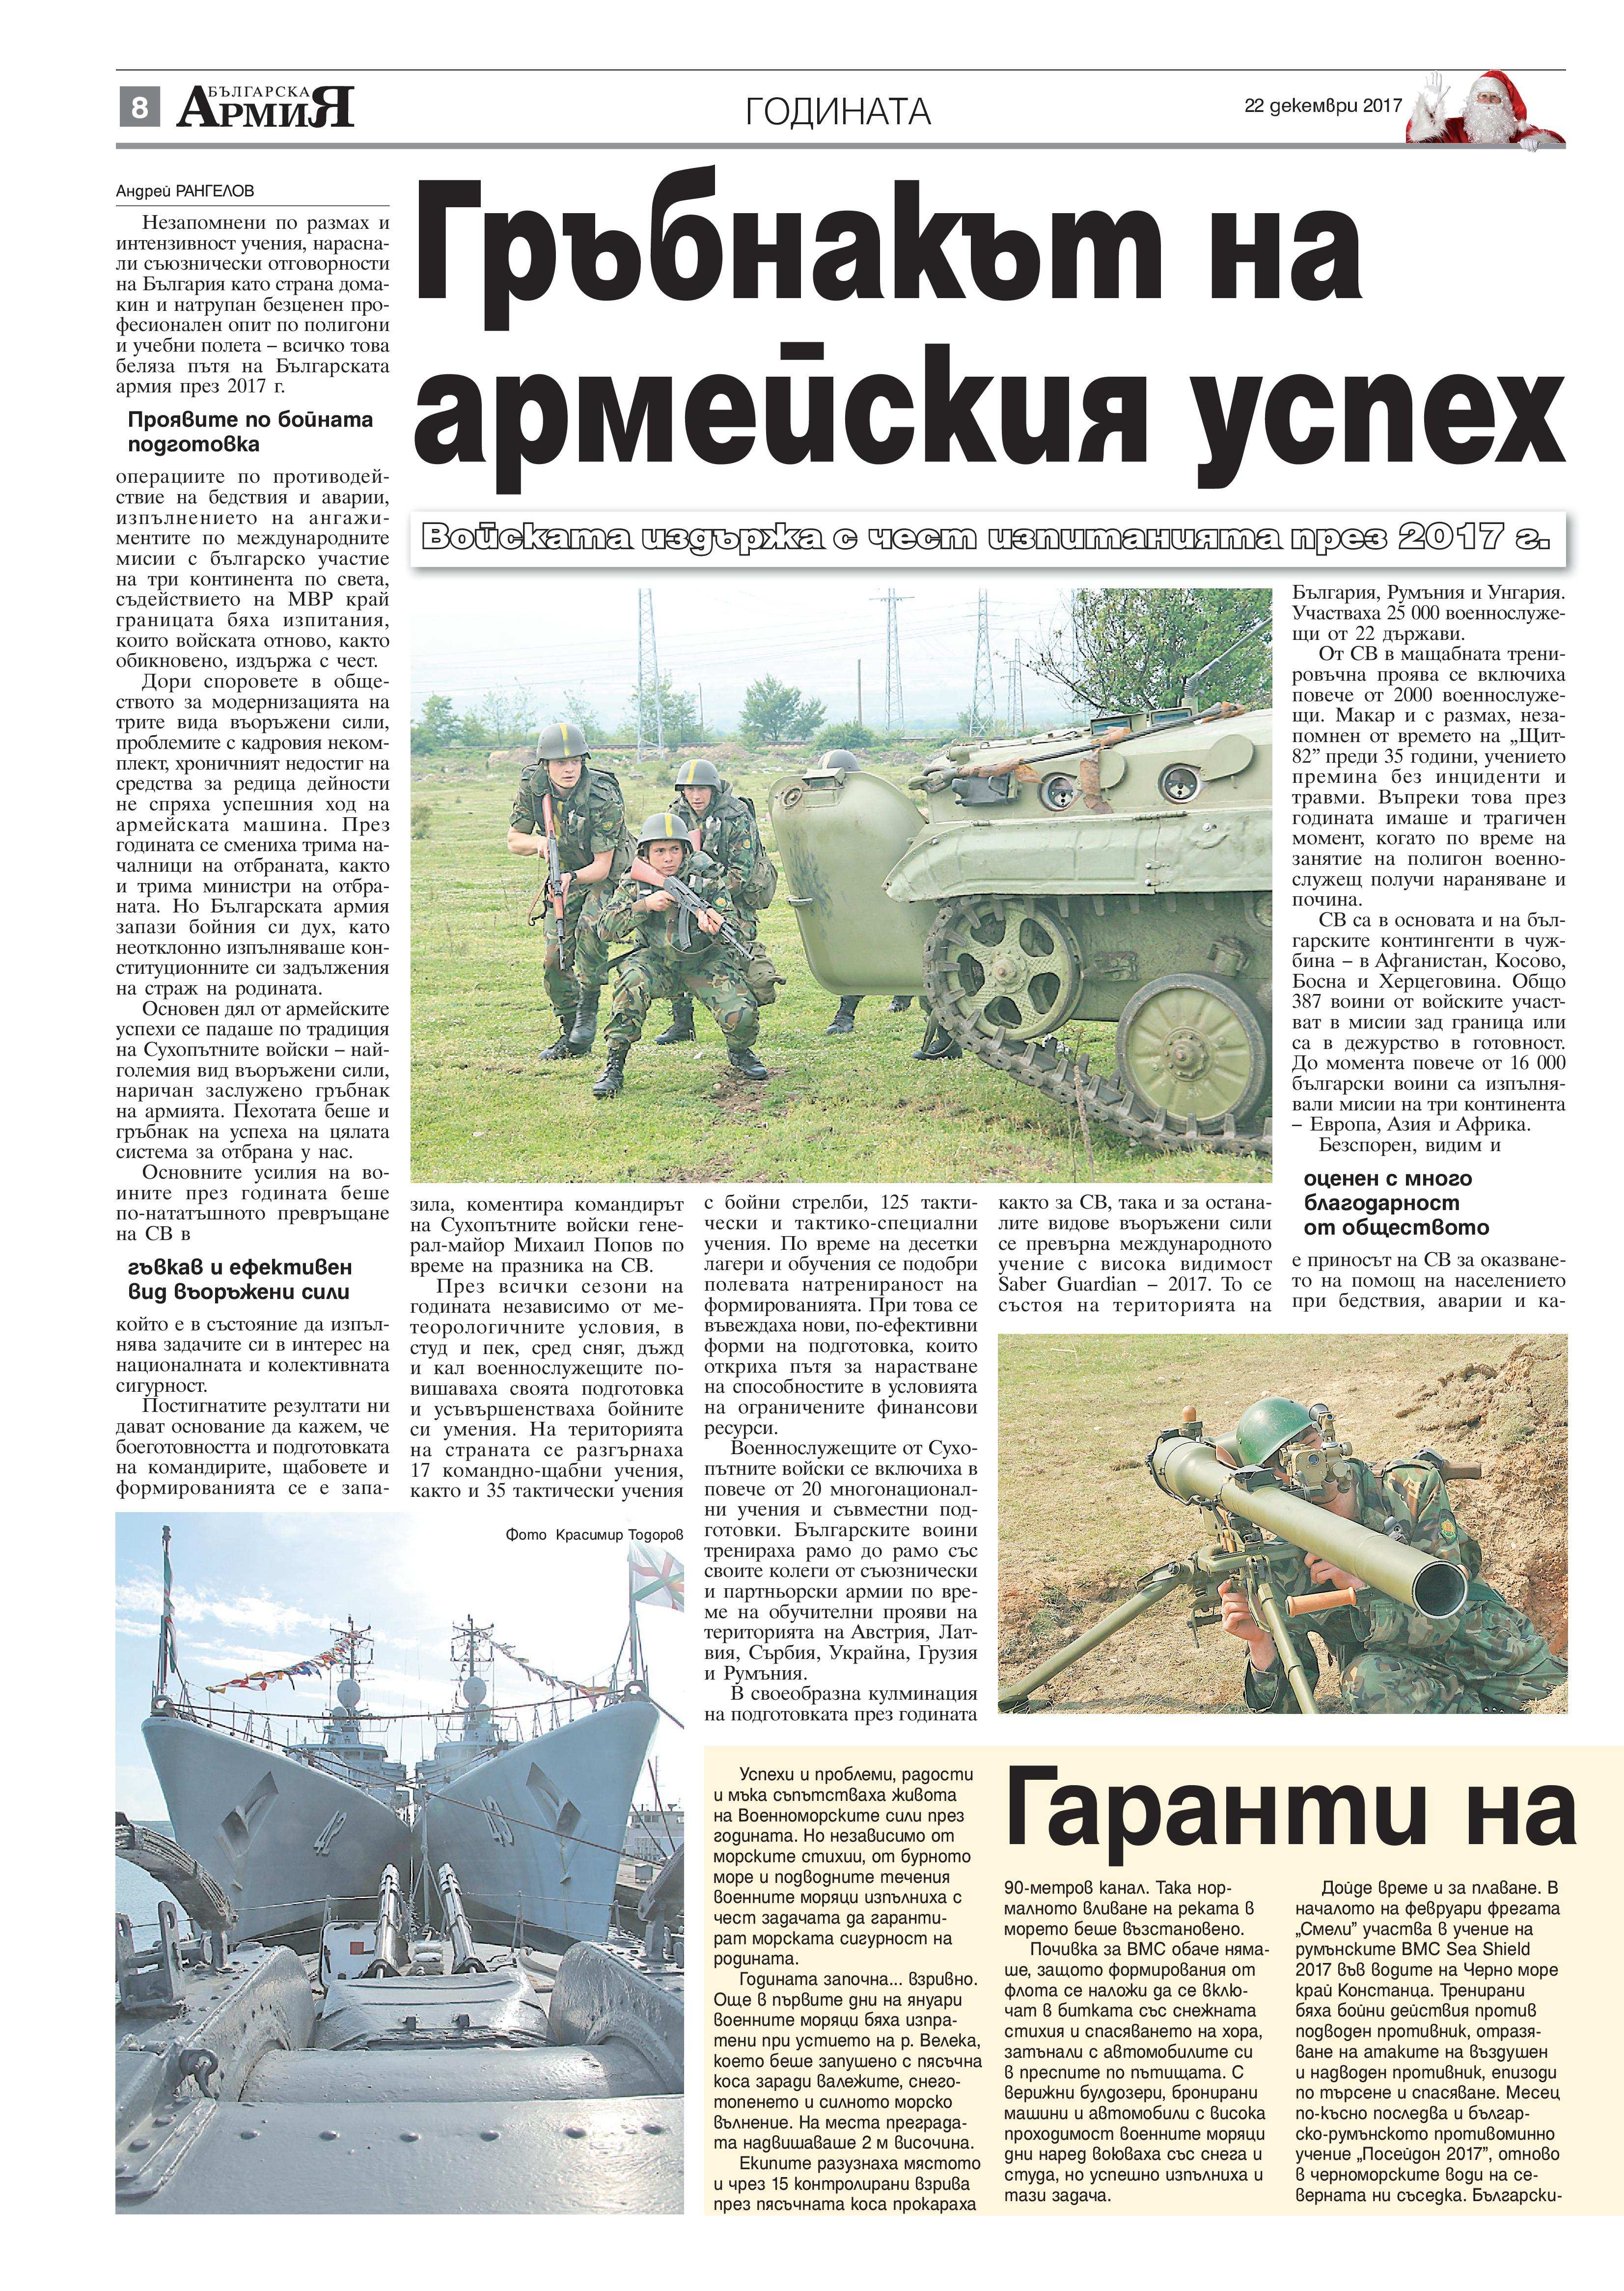 http://armymedia.bg/wp-content/uploads/2015/06/08-15.jpg